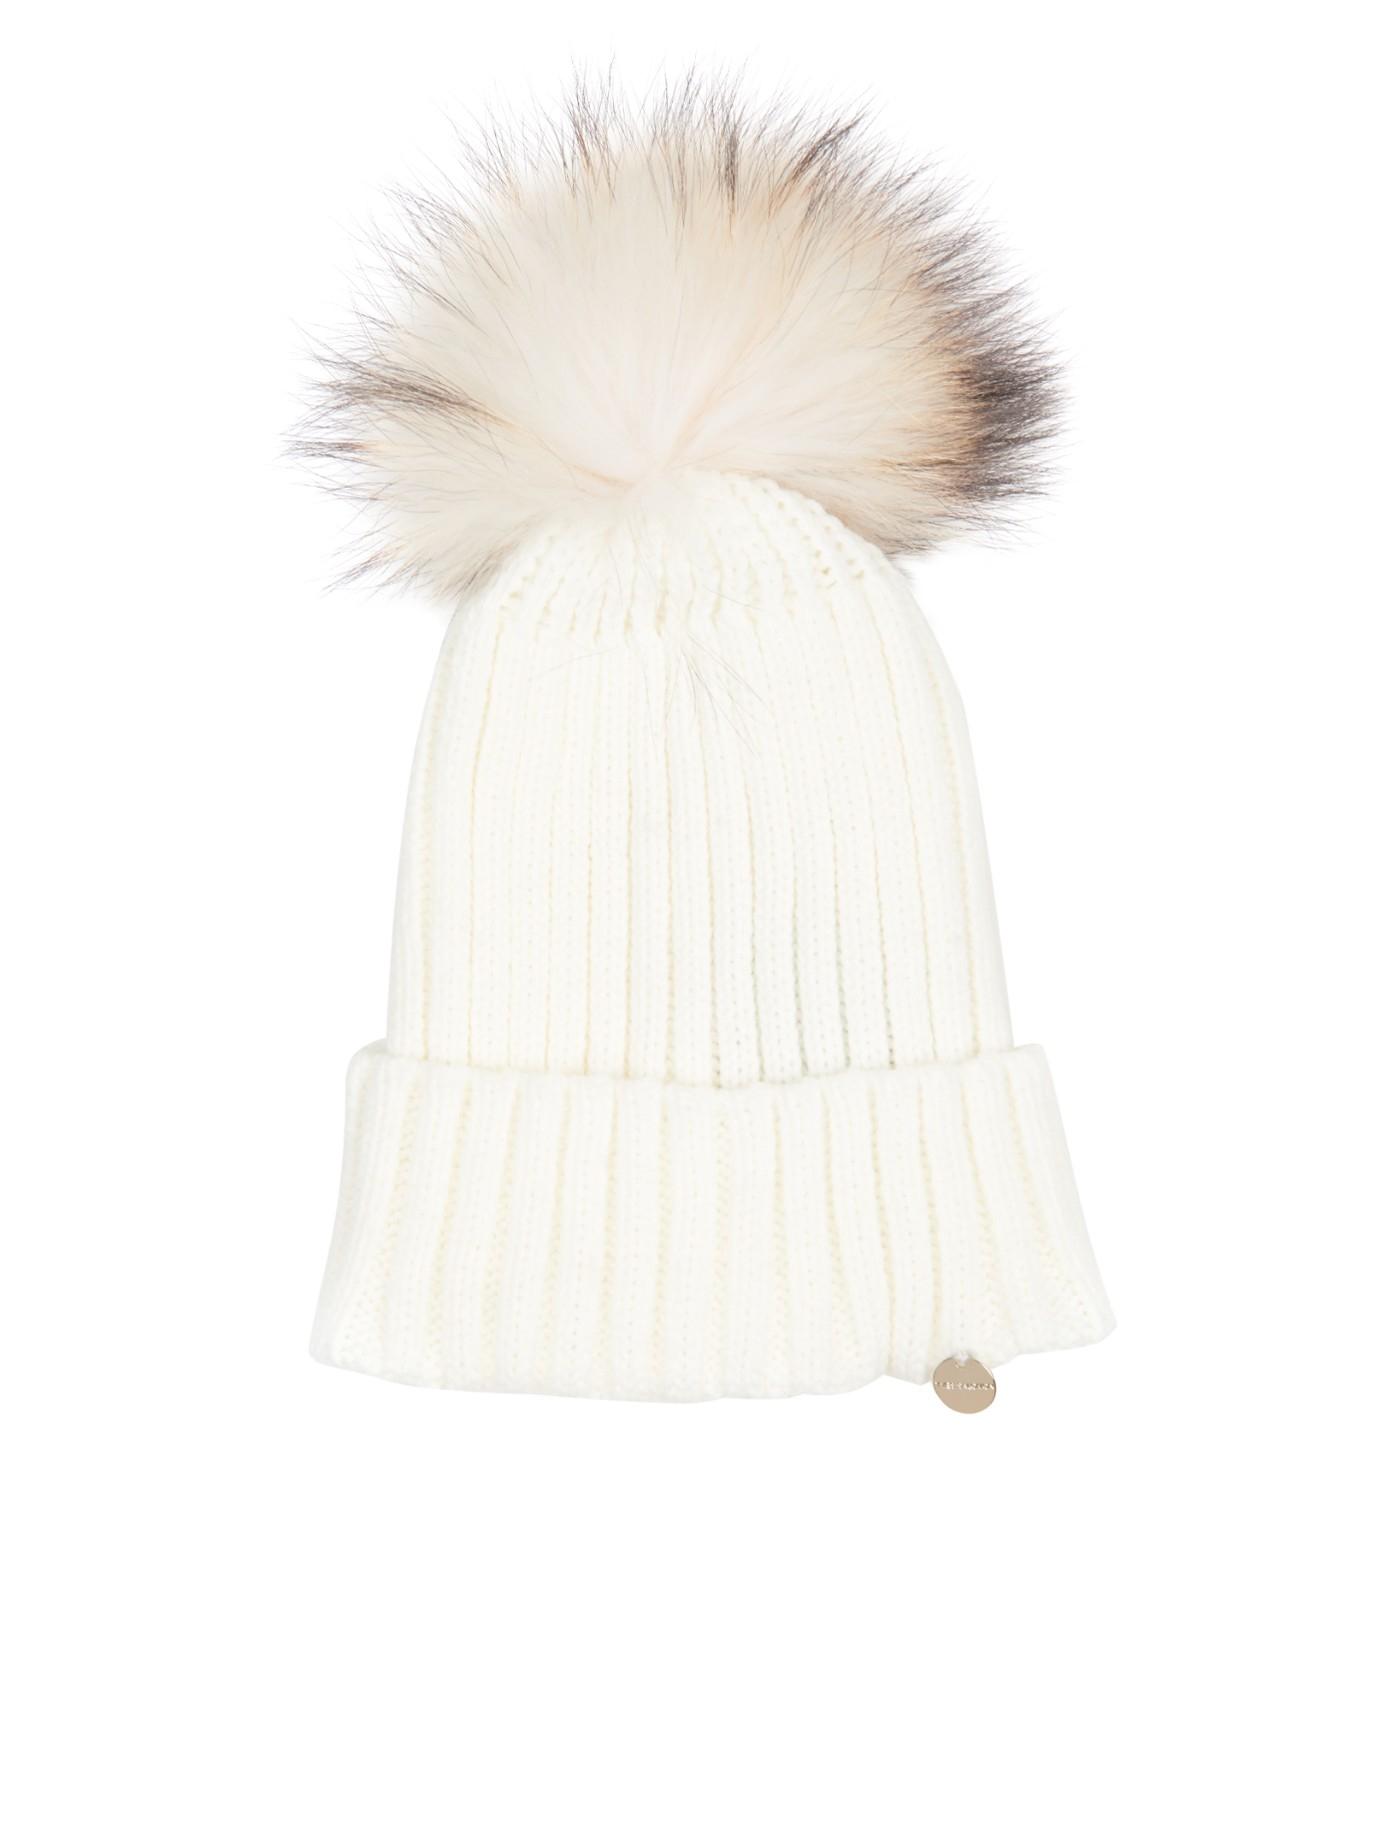 c88218a27f9 Yves Salomon Fur-pompom Knit Beanie Hat in White - Lyst